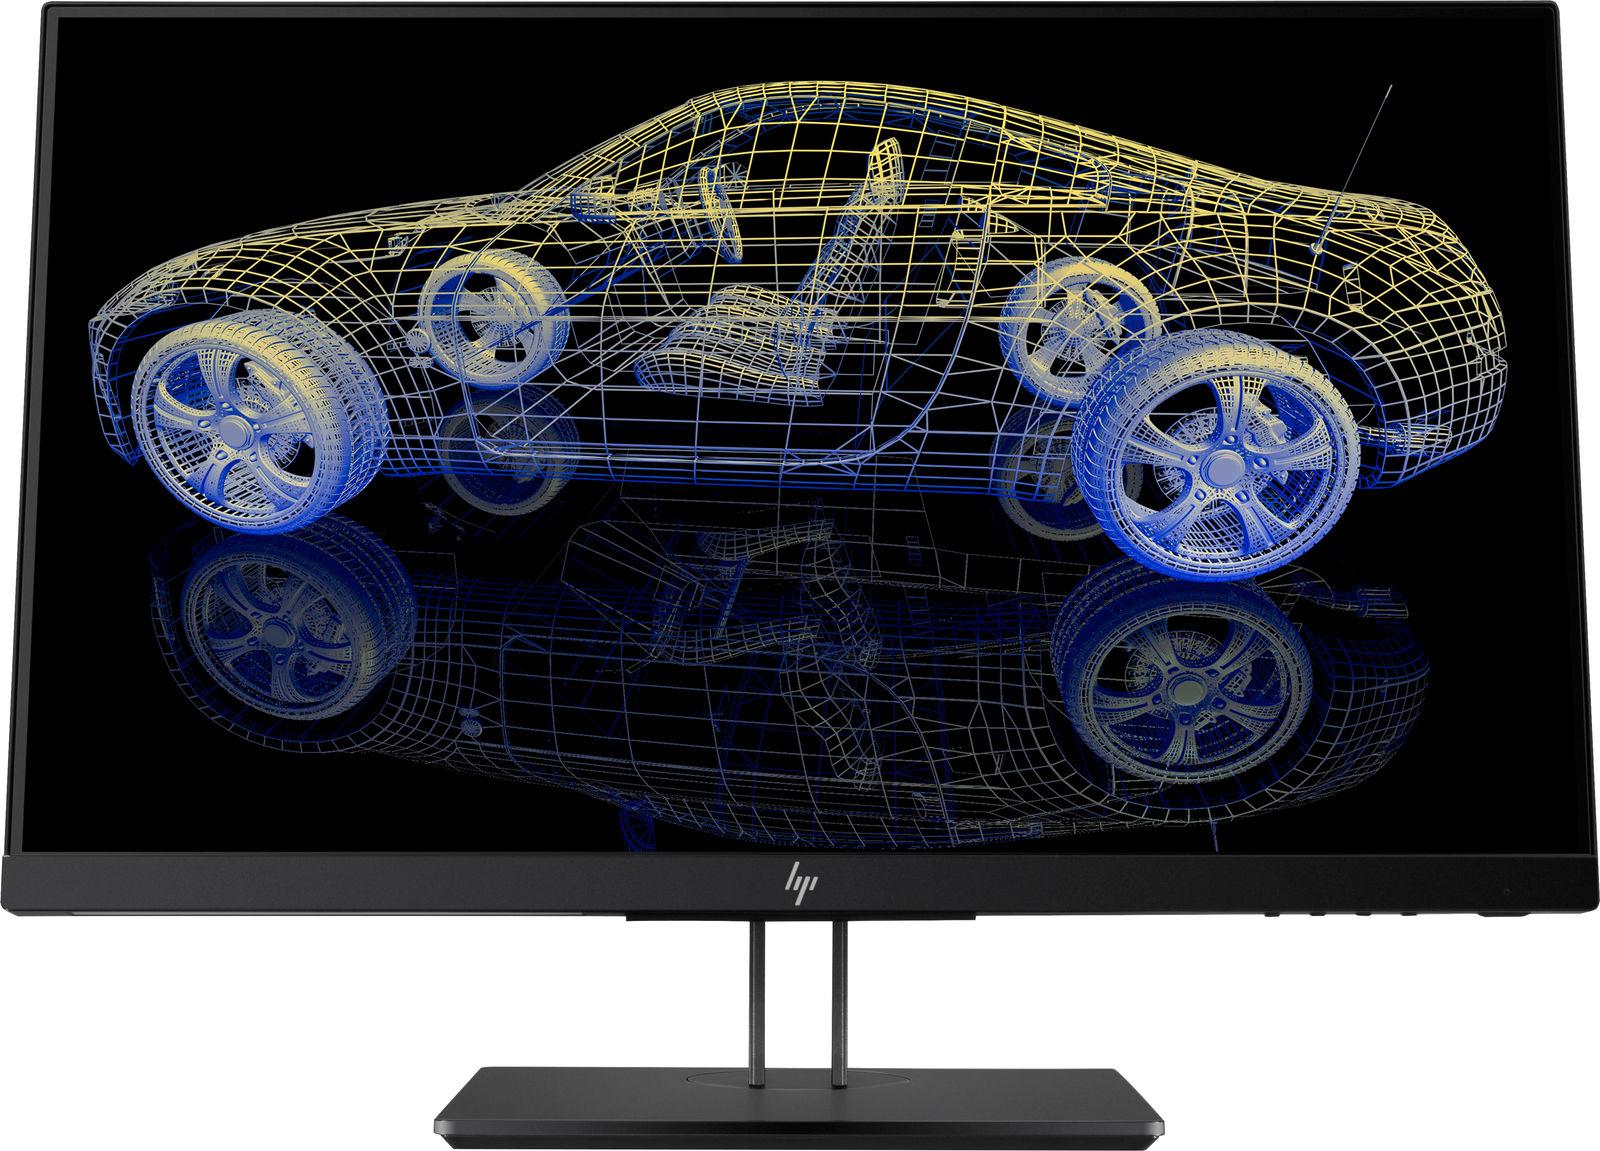 "HP Z23n G2 LED display 58.4 cm (23"") Full HD Flat Black"